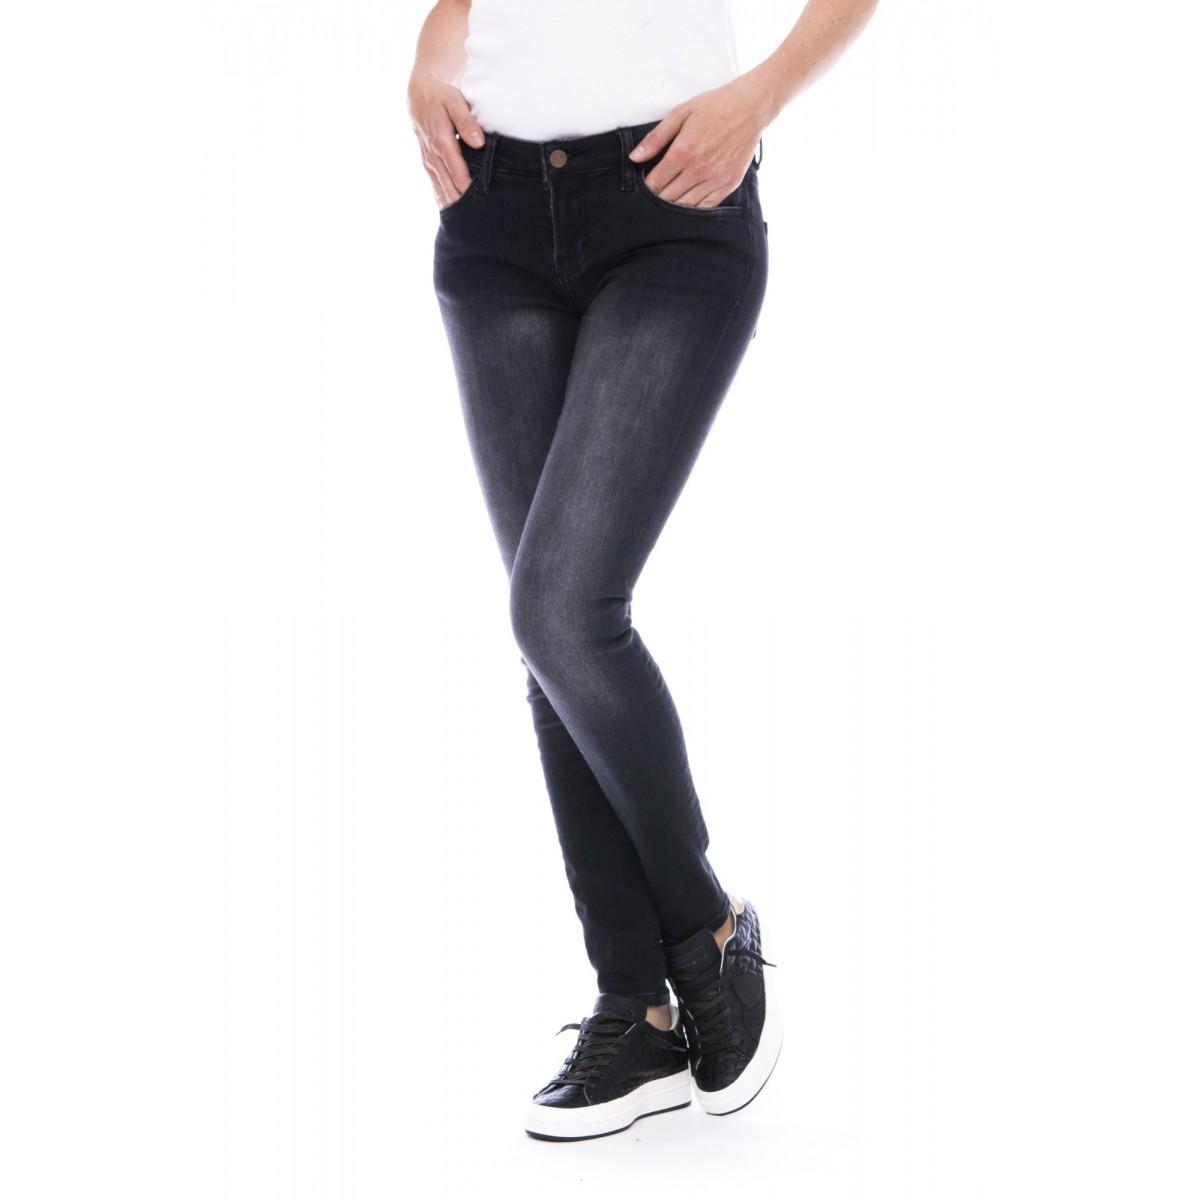 Jeans Sun 68 - 26278 jeans nero